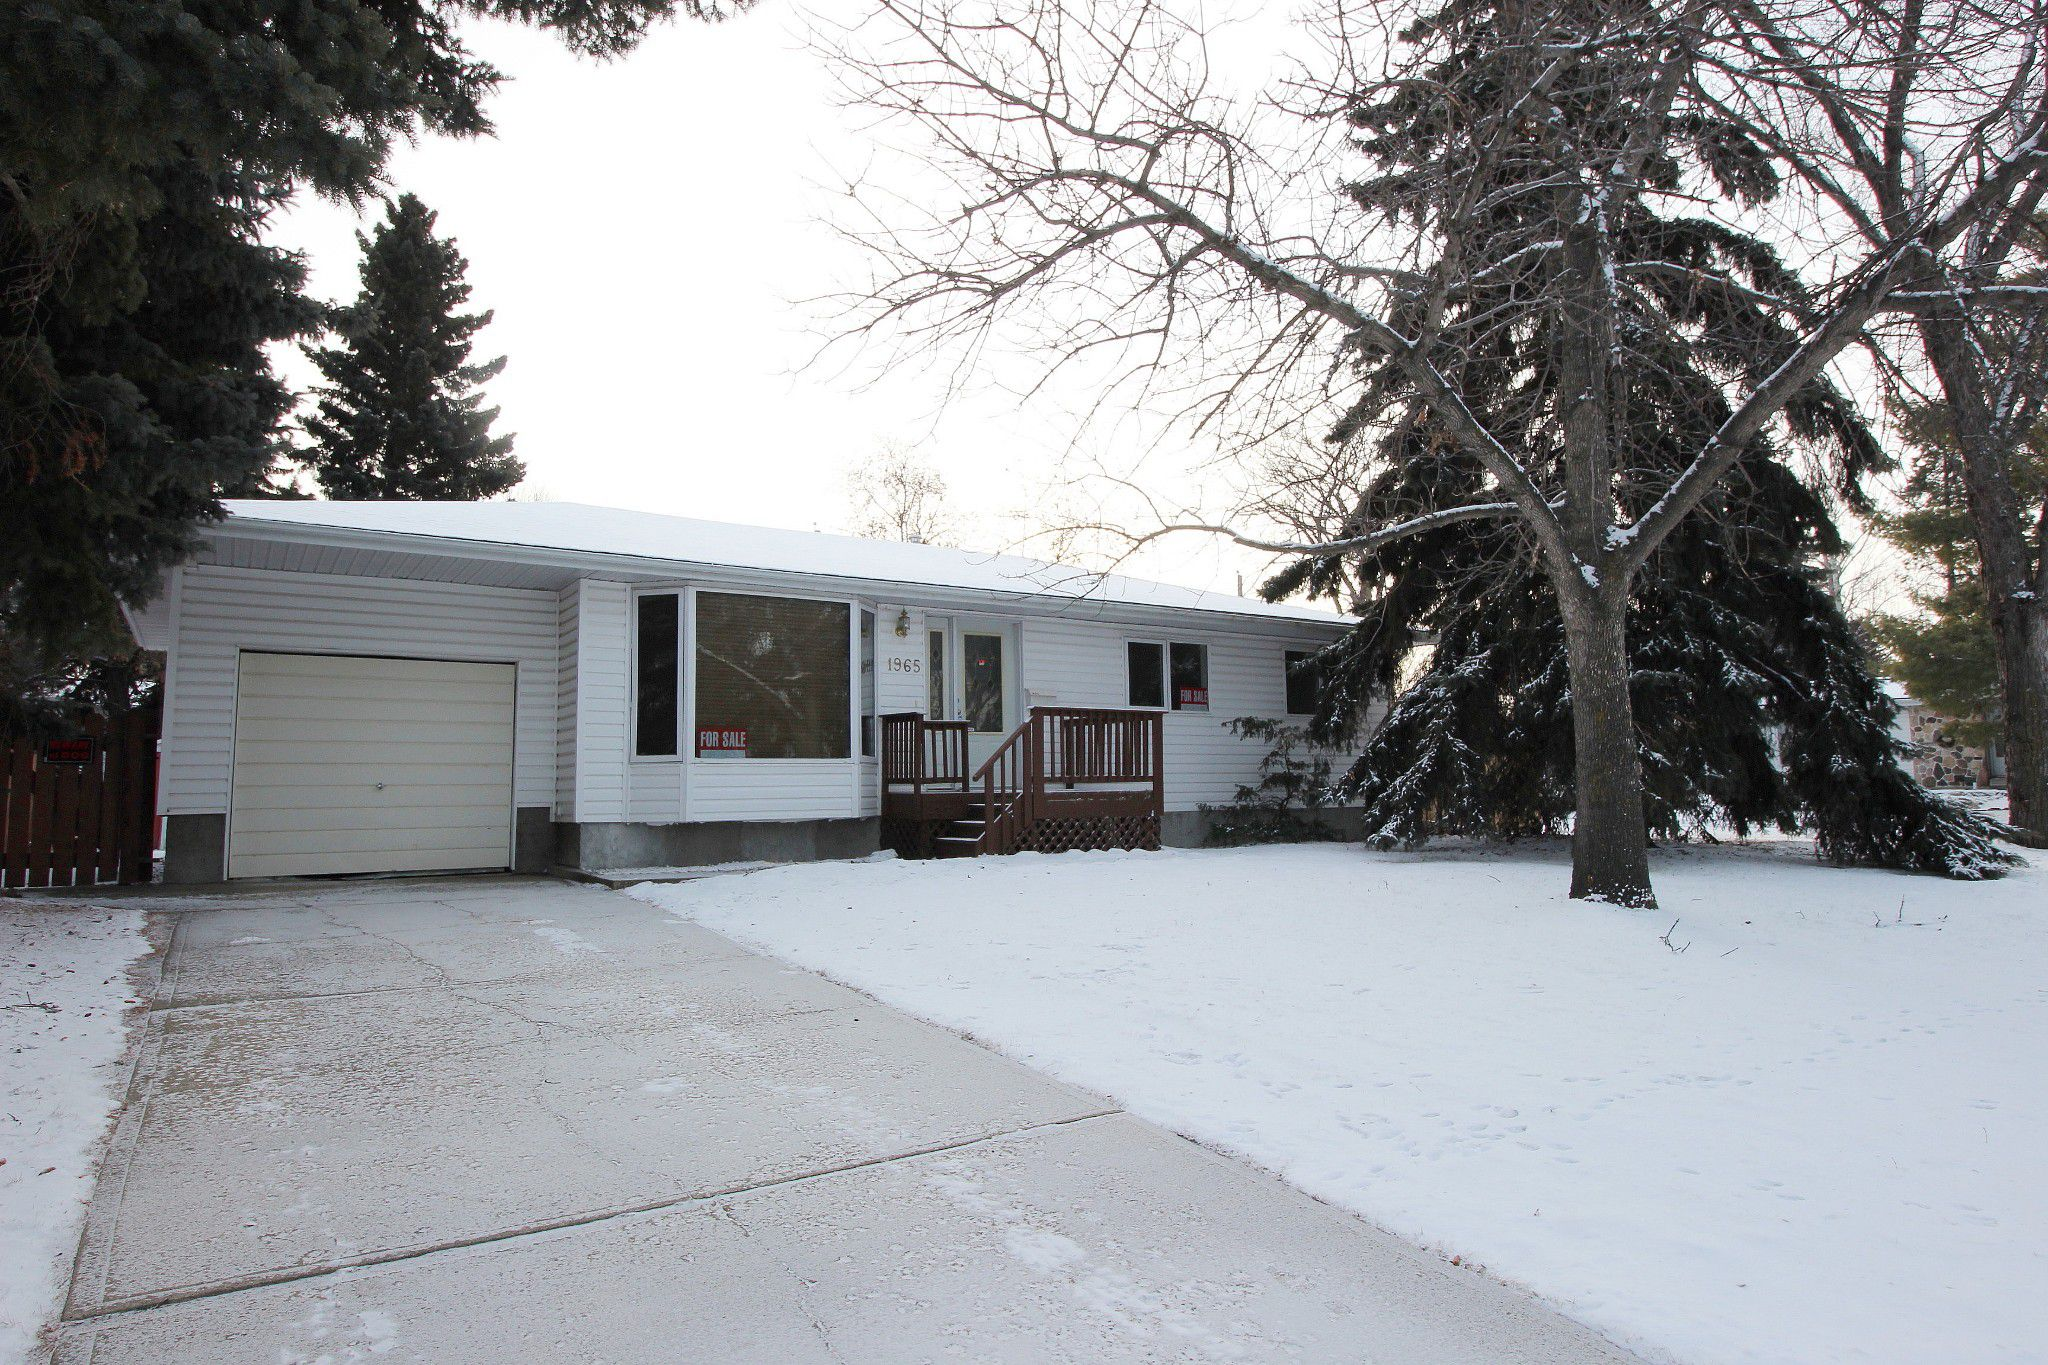 Main Photo: 1965 Glenmore Avenue in Edmonton: House for sale